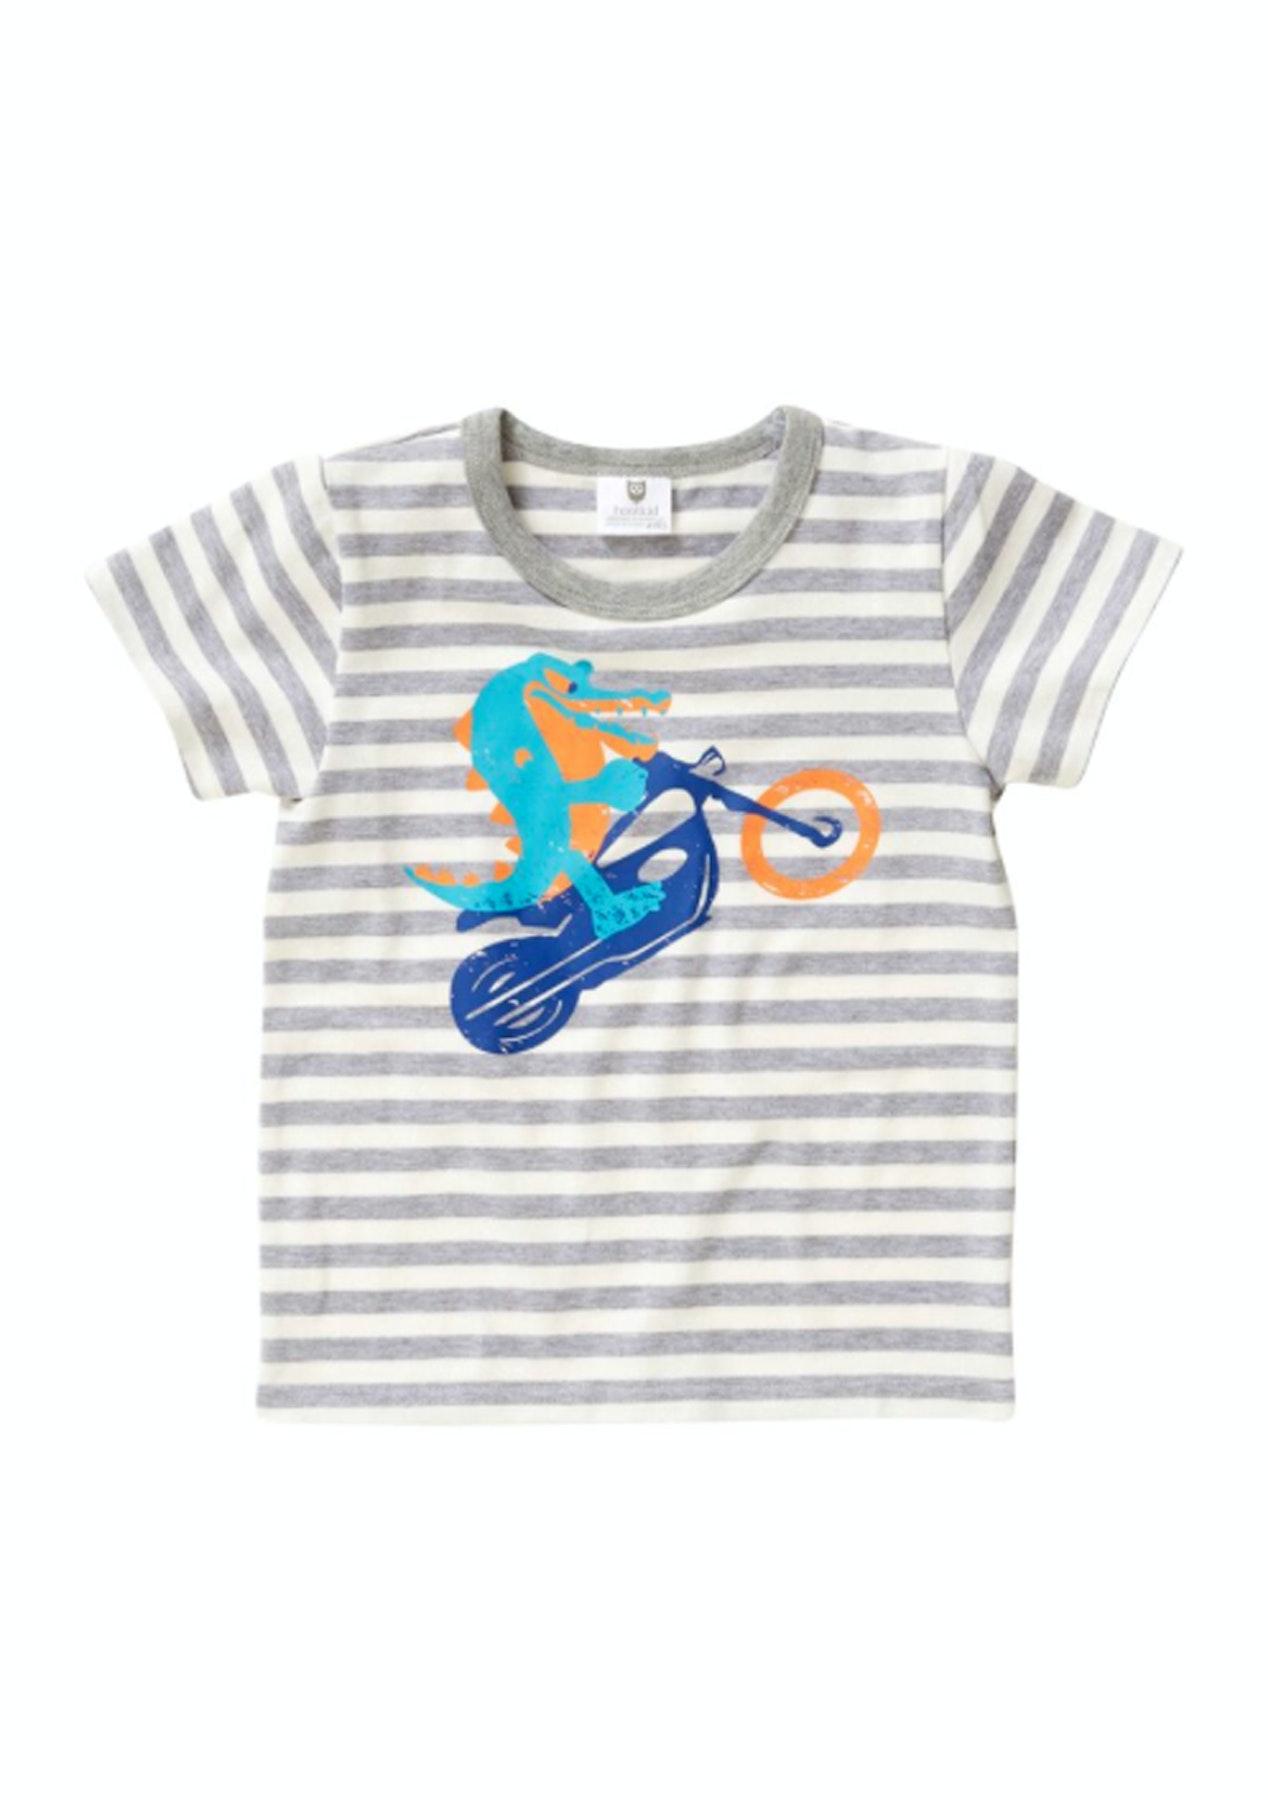 4bbc022cd Hootkid - Sweet Ride Tee - Grey Marle Stripe - Hootkid Everything ...